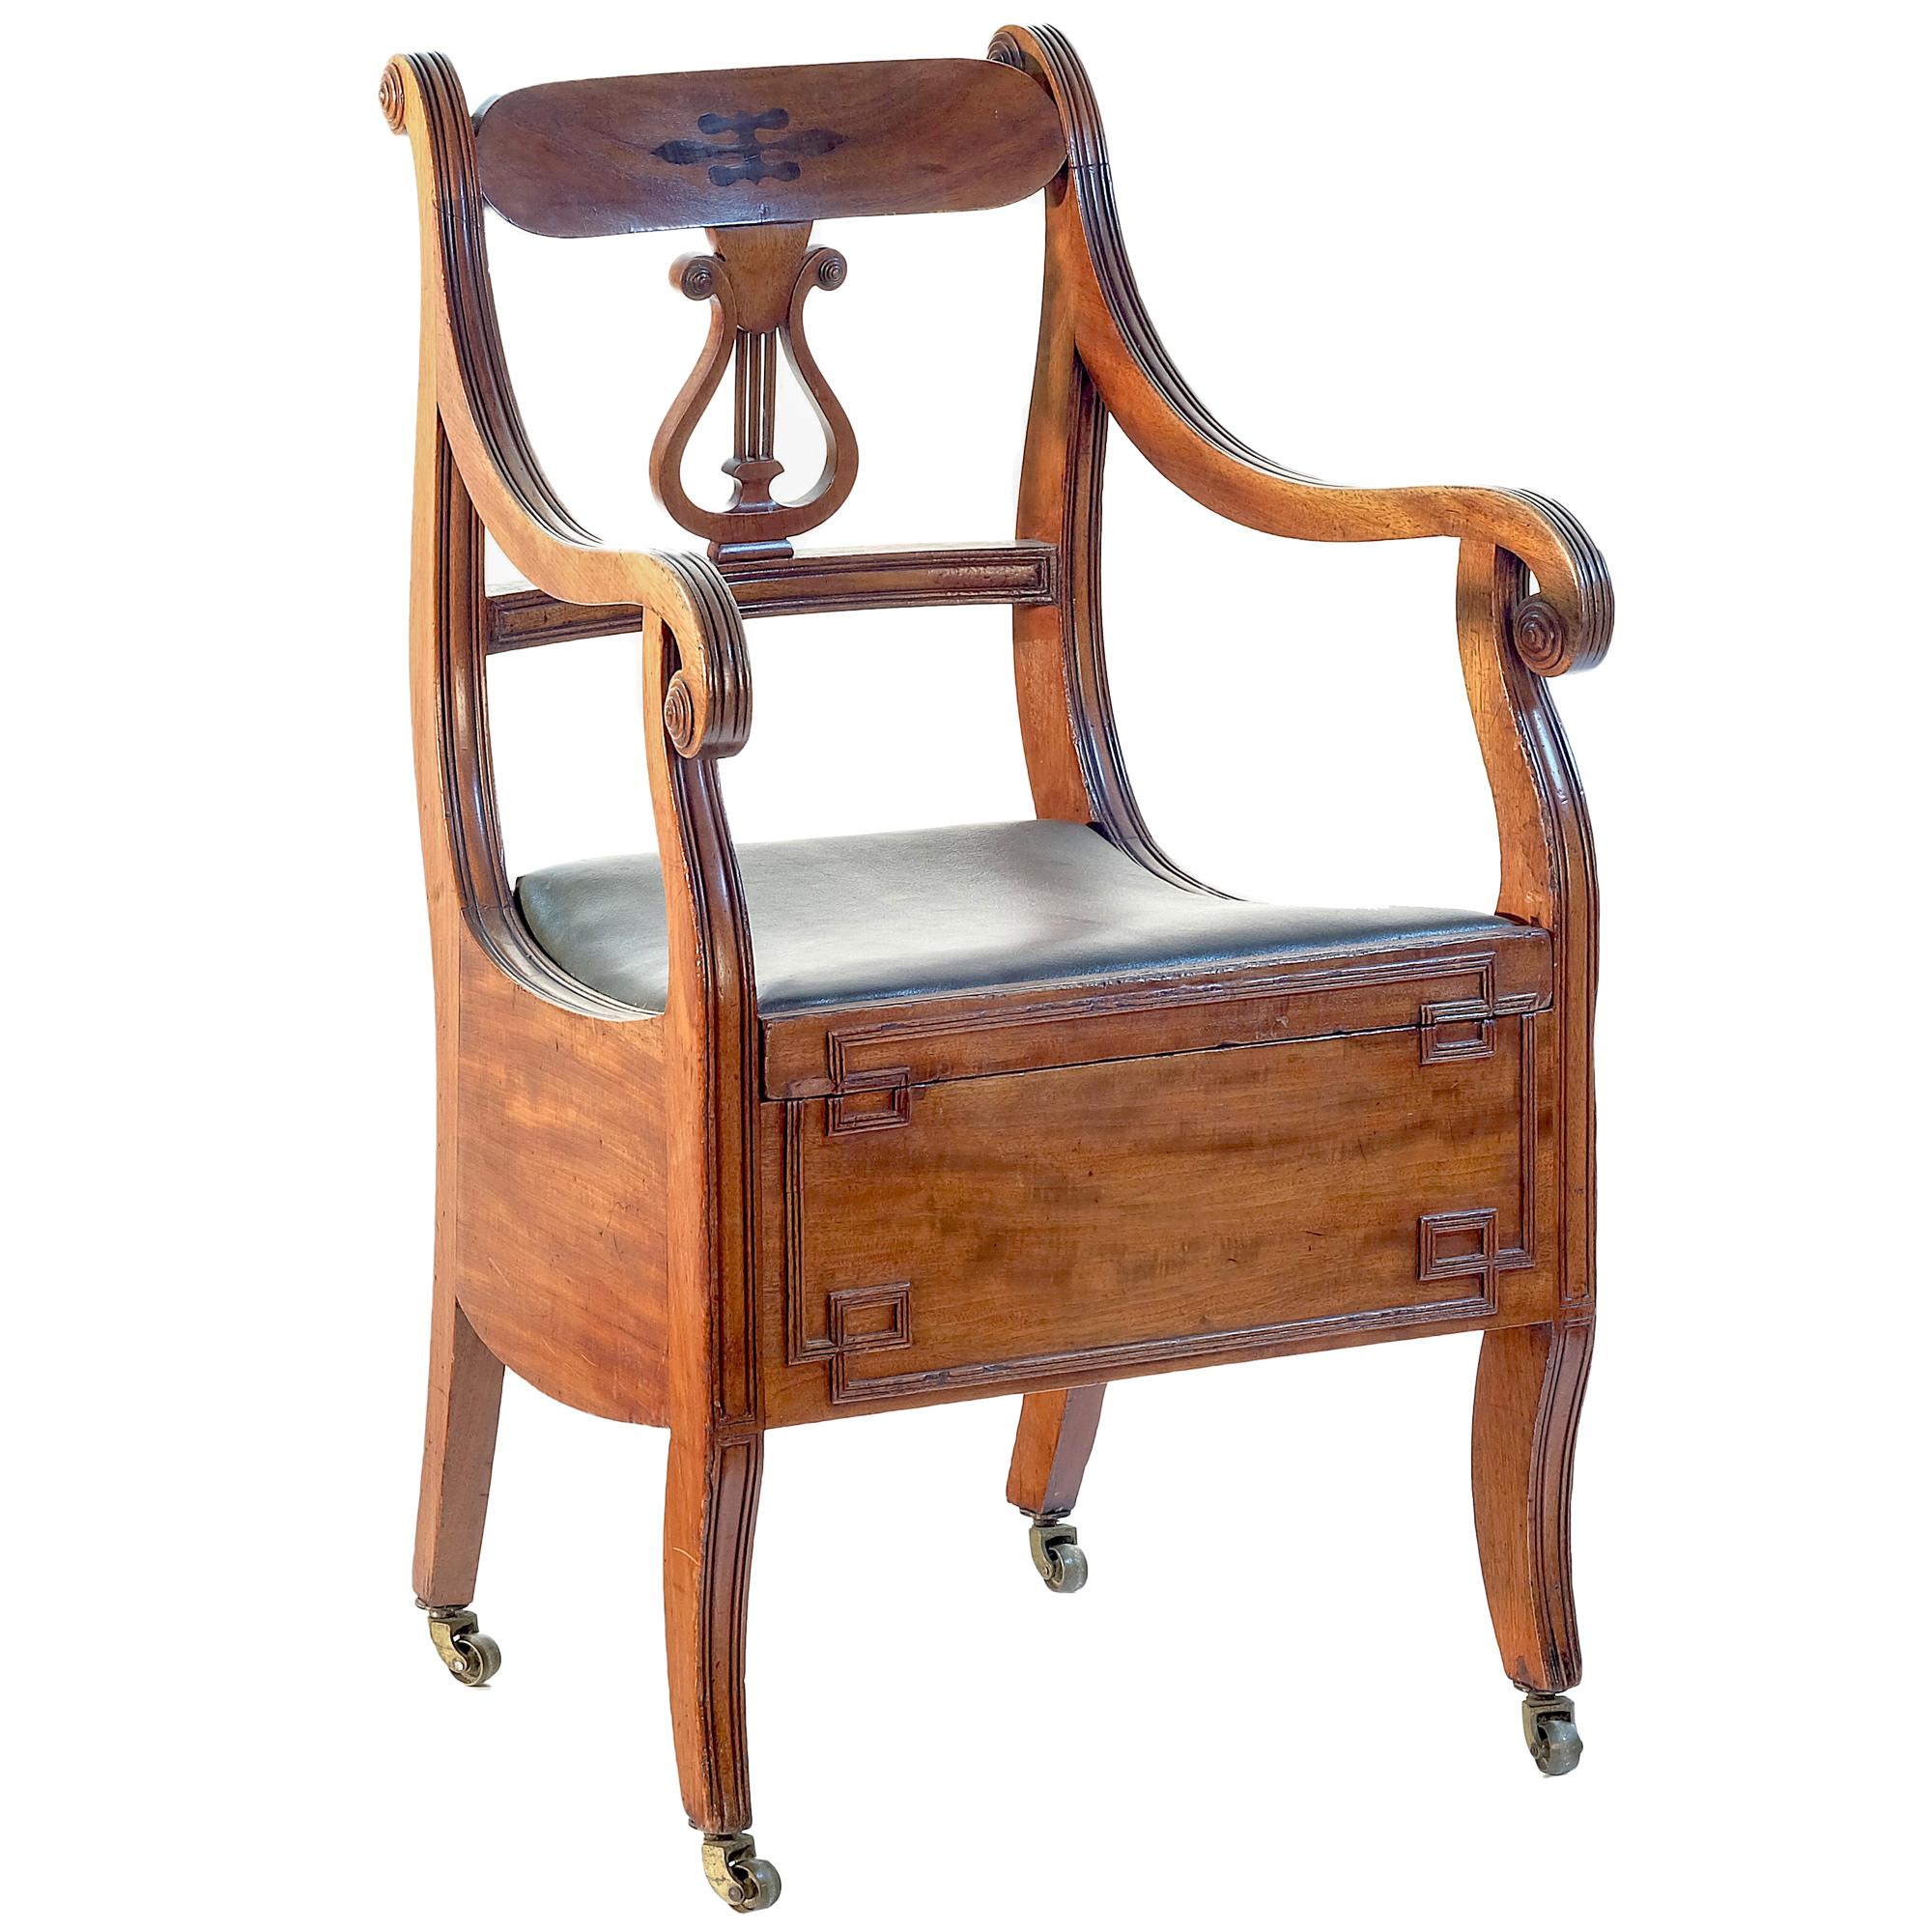 'Regency Period Lyre Back Mahogany Commode with Purpleheart Inlay Circa 1815'